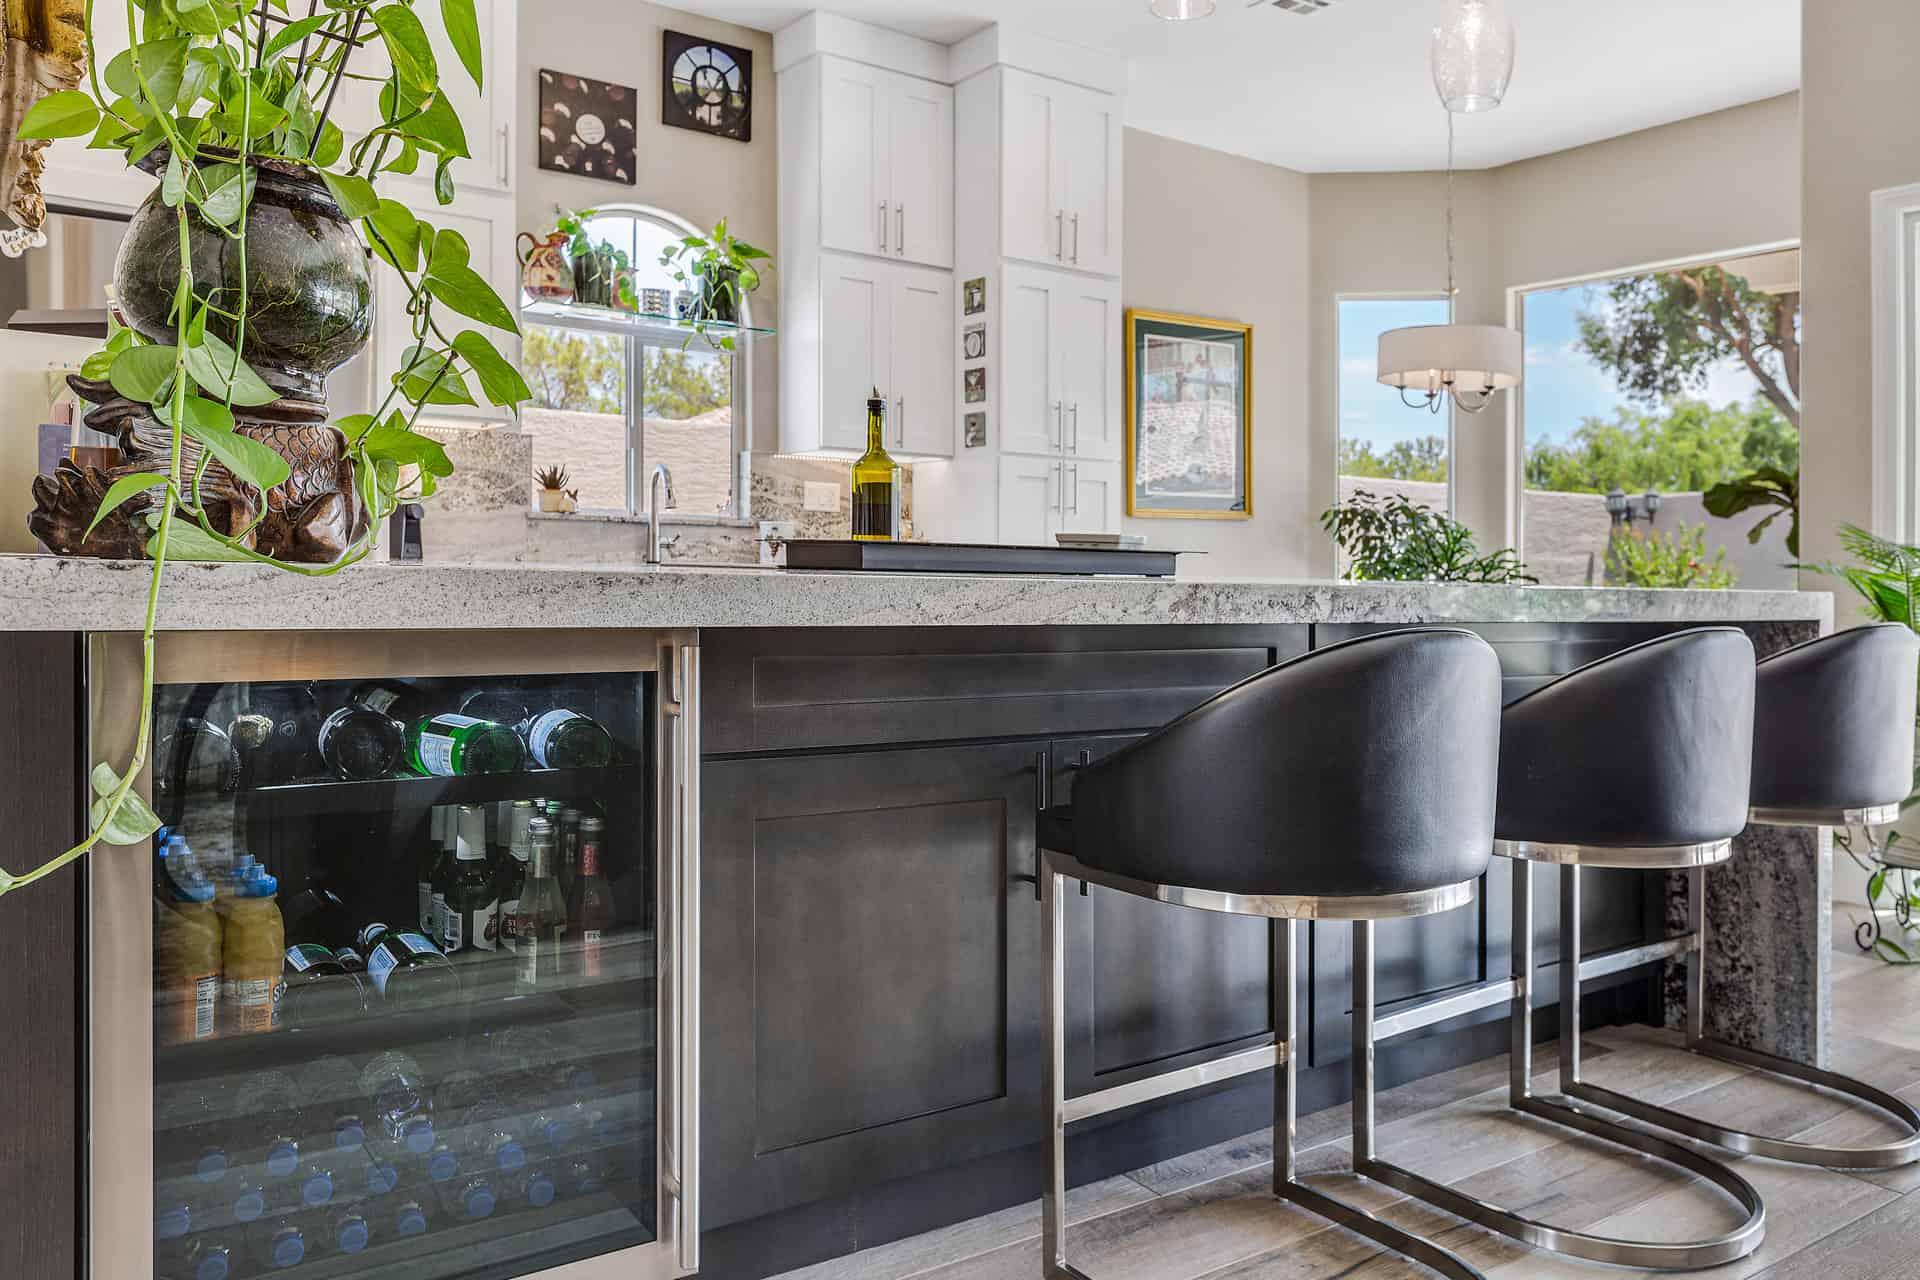 breakfast bar and beverage refrigerator